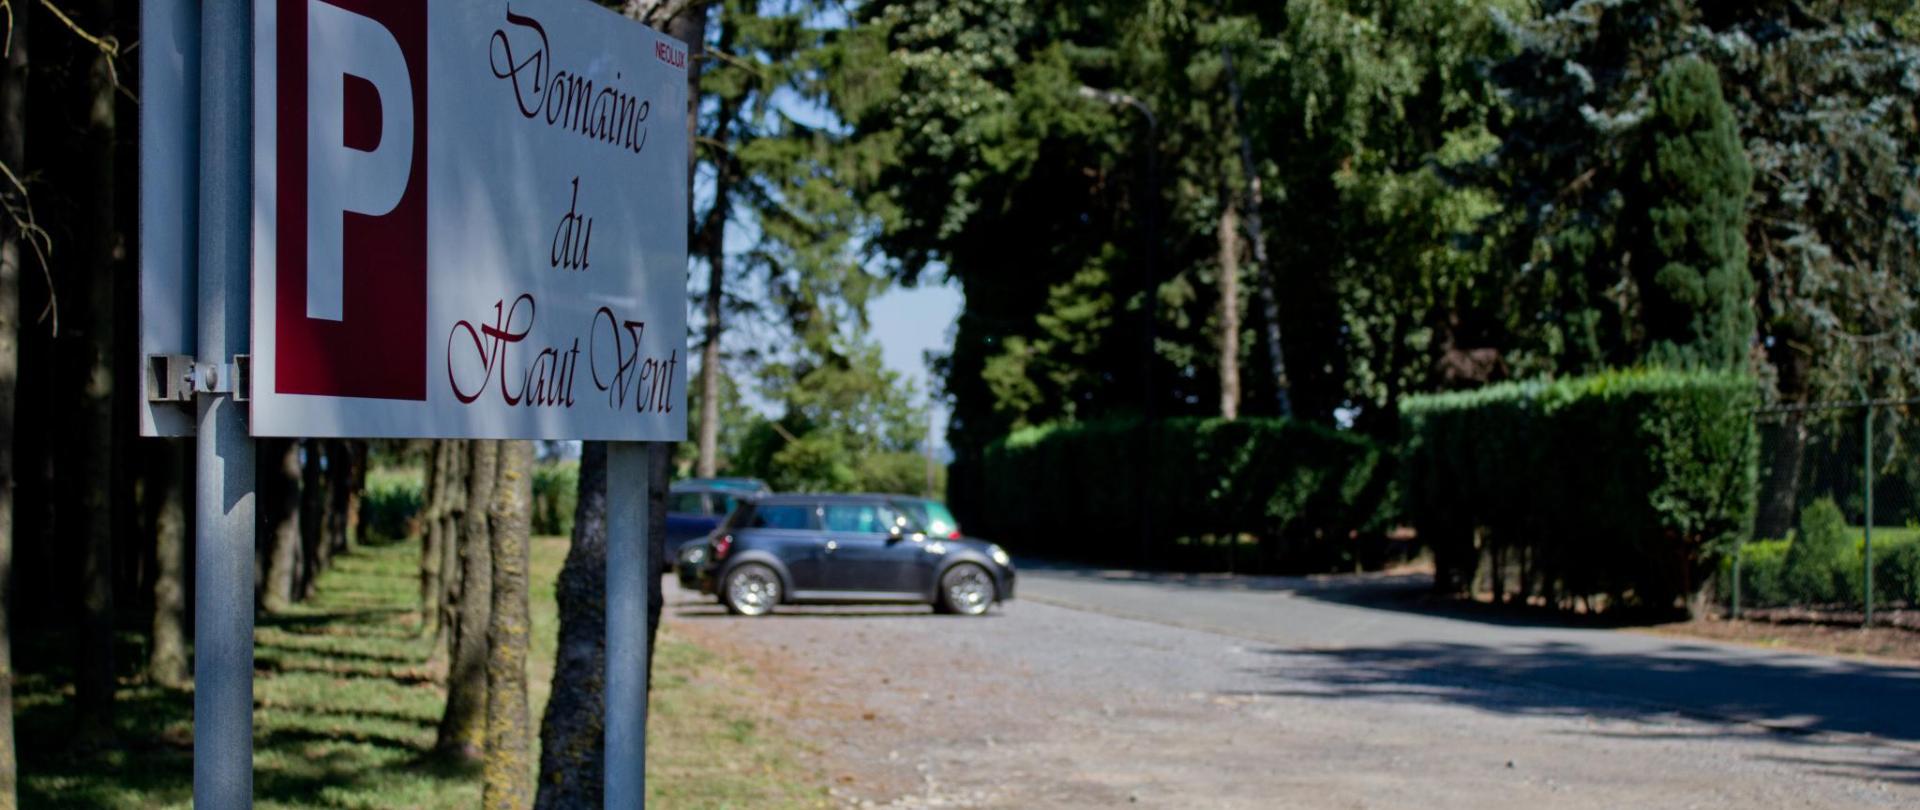 Parking Côté.JPG